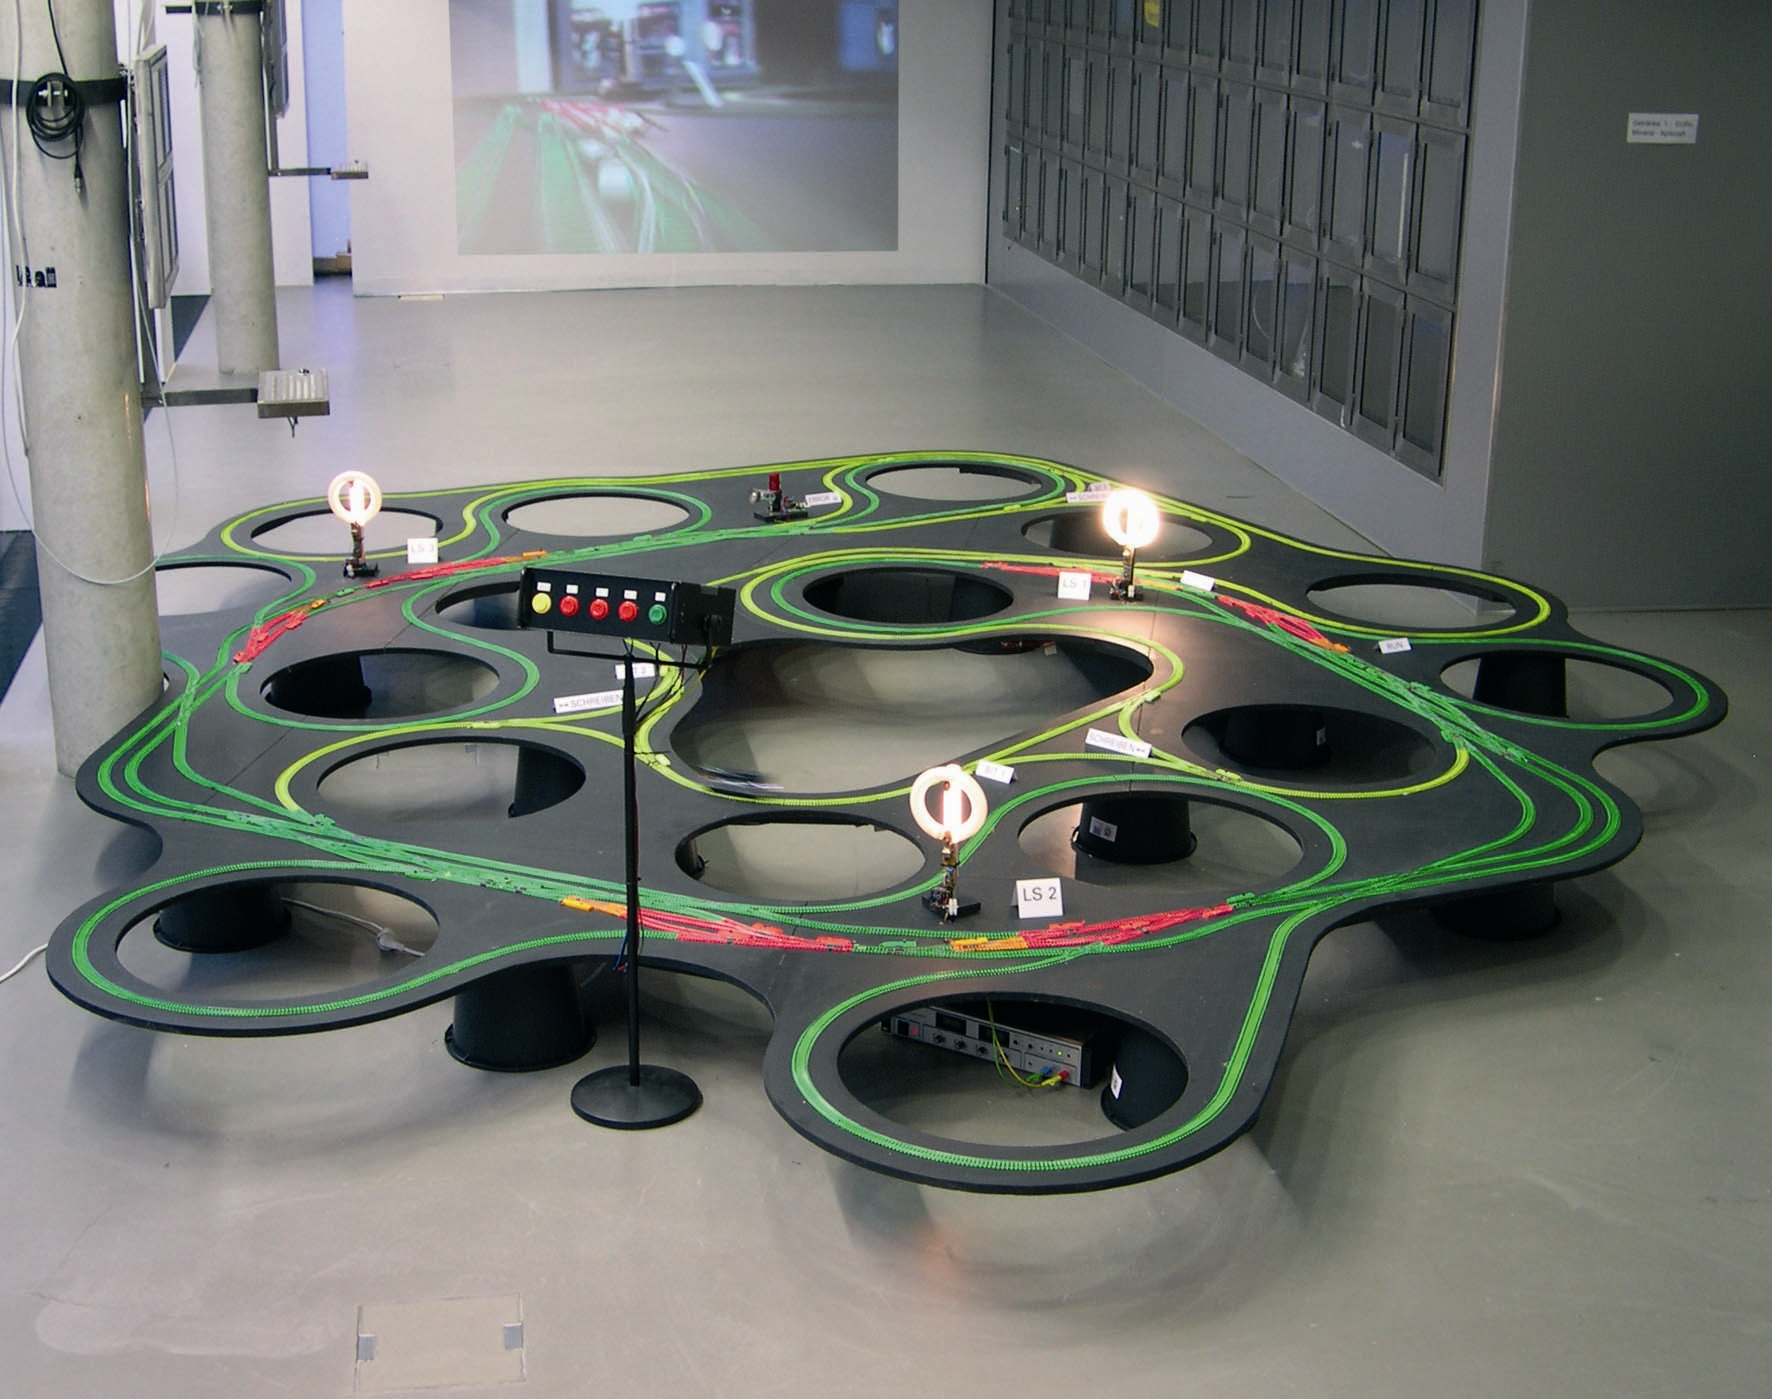 Severin Hofmann - David Moises: Turing Train Terminal, installáció, 2004